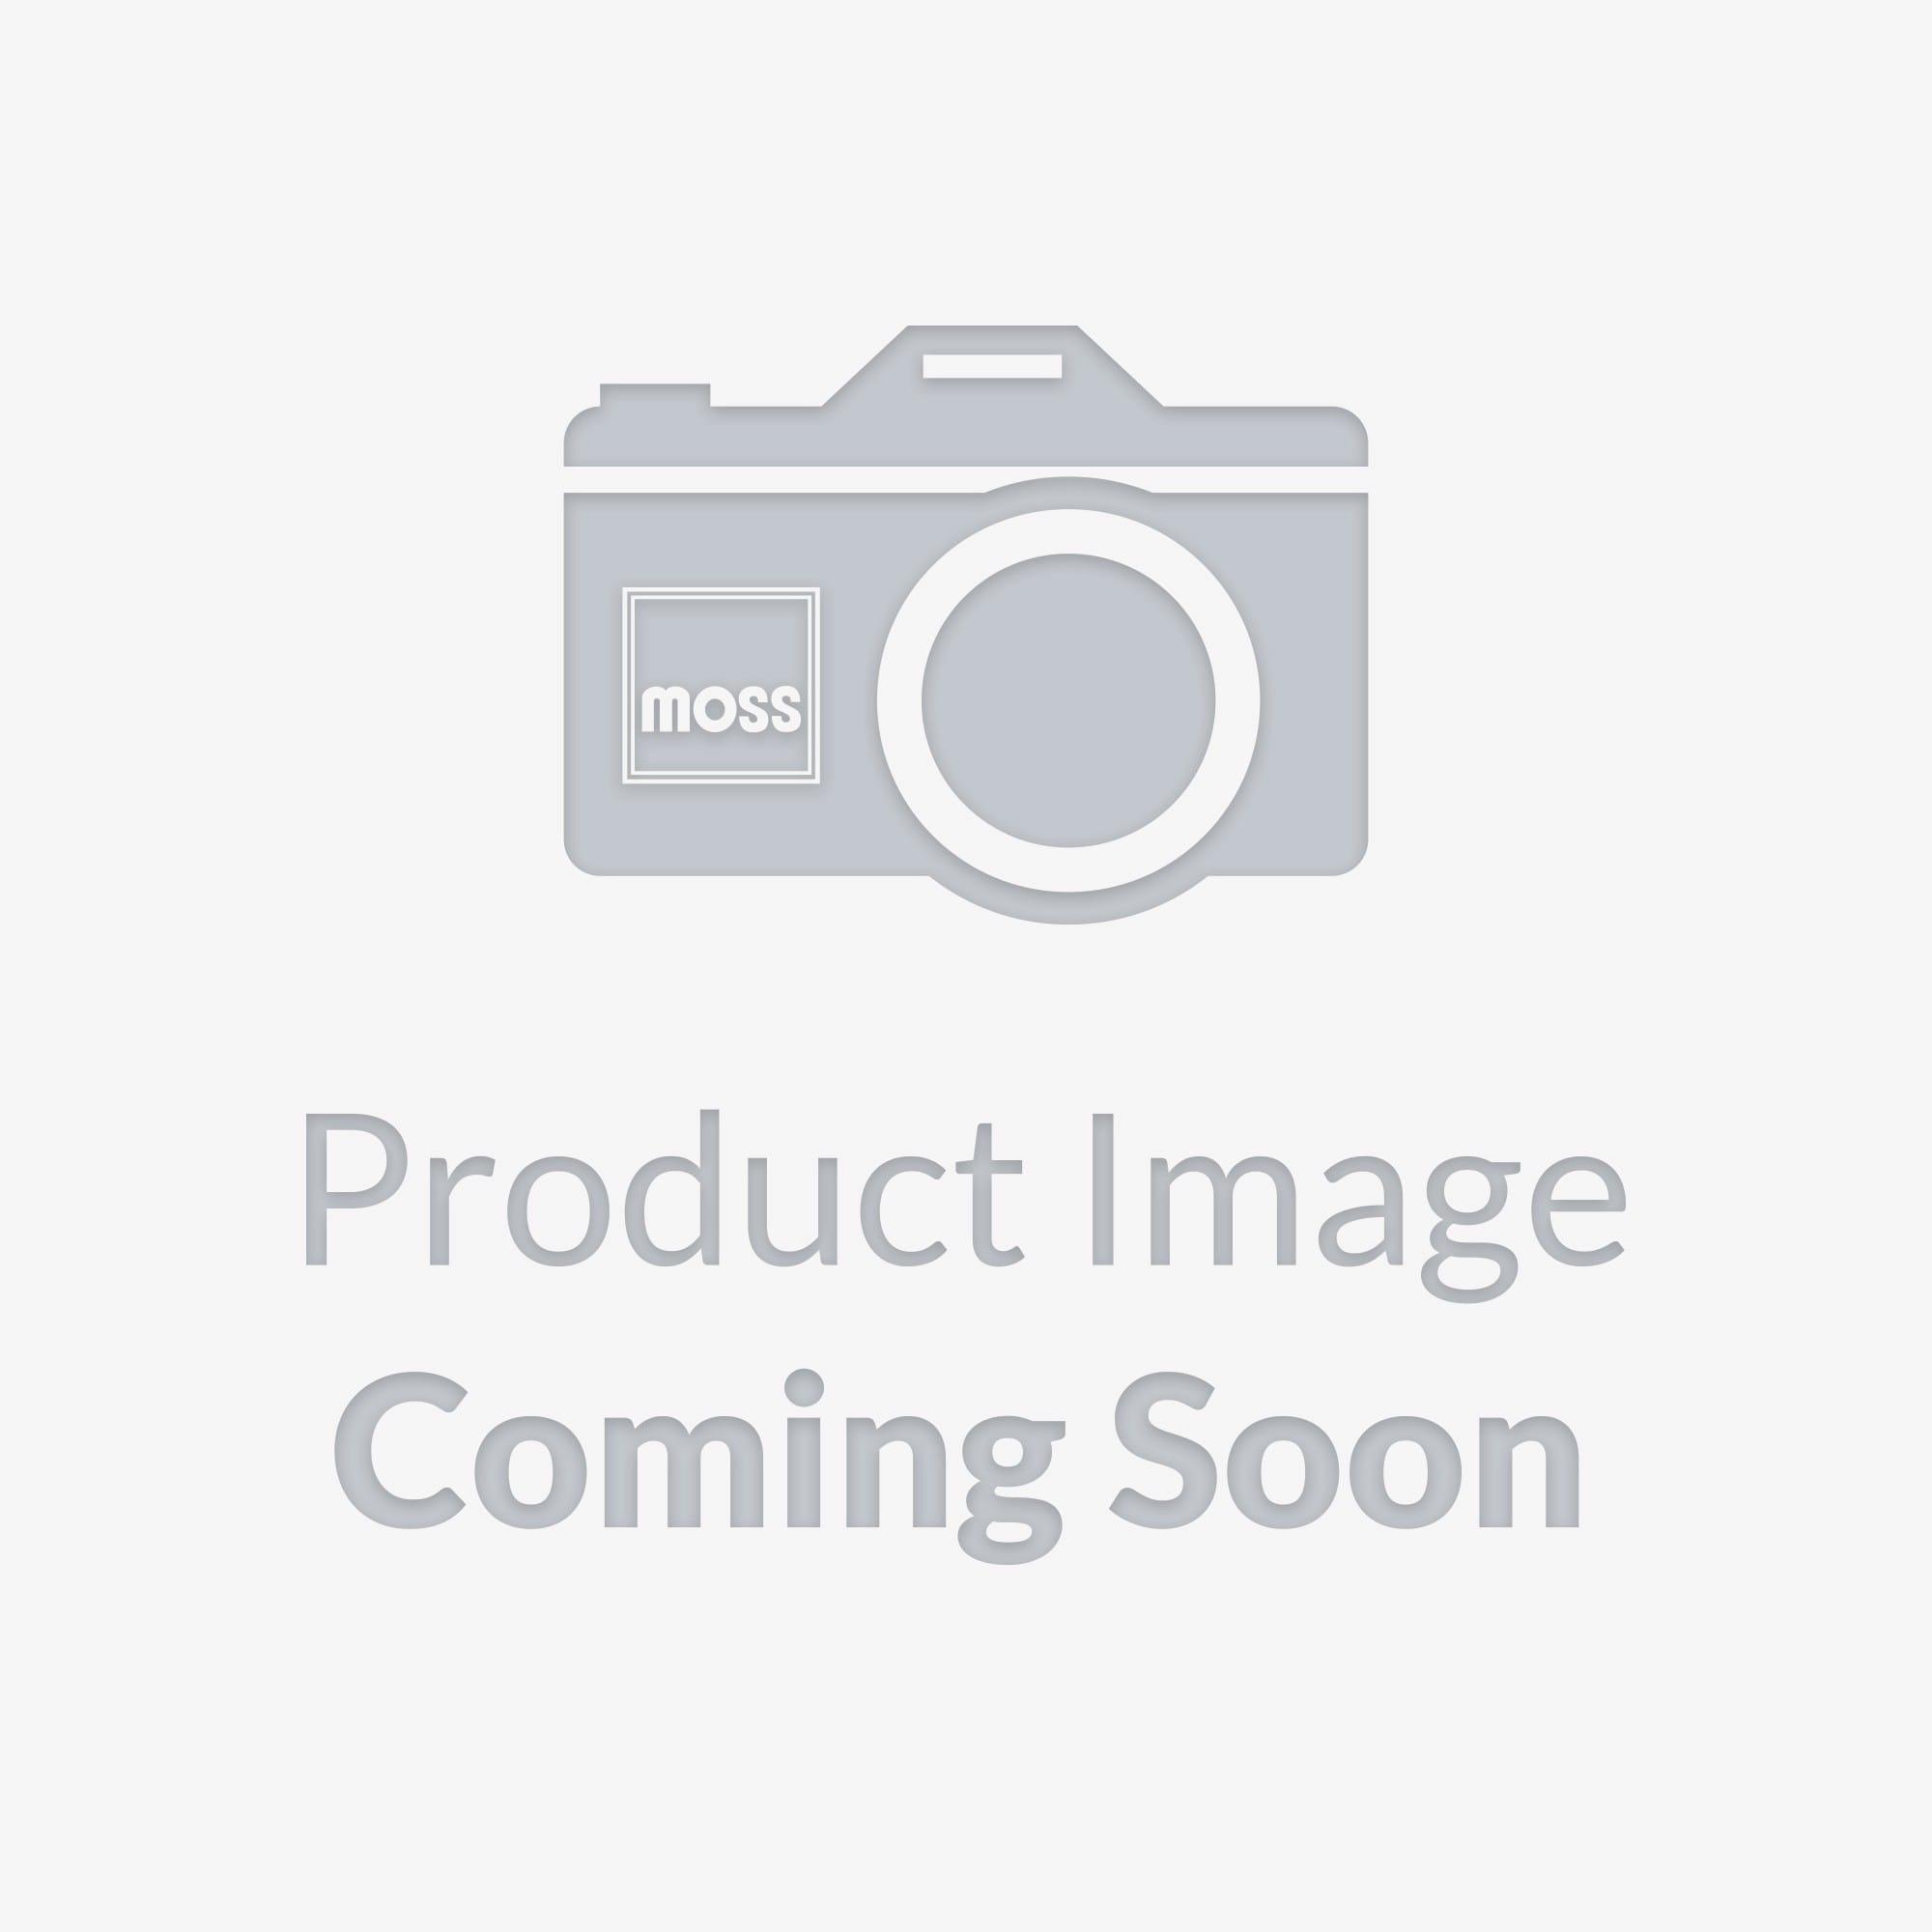 1999 mazda miata owners manual pdf